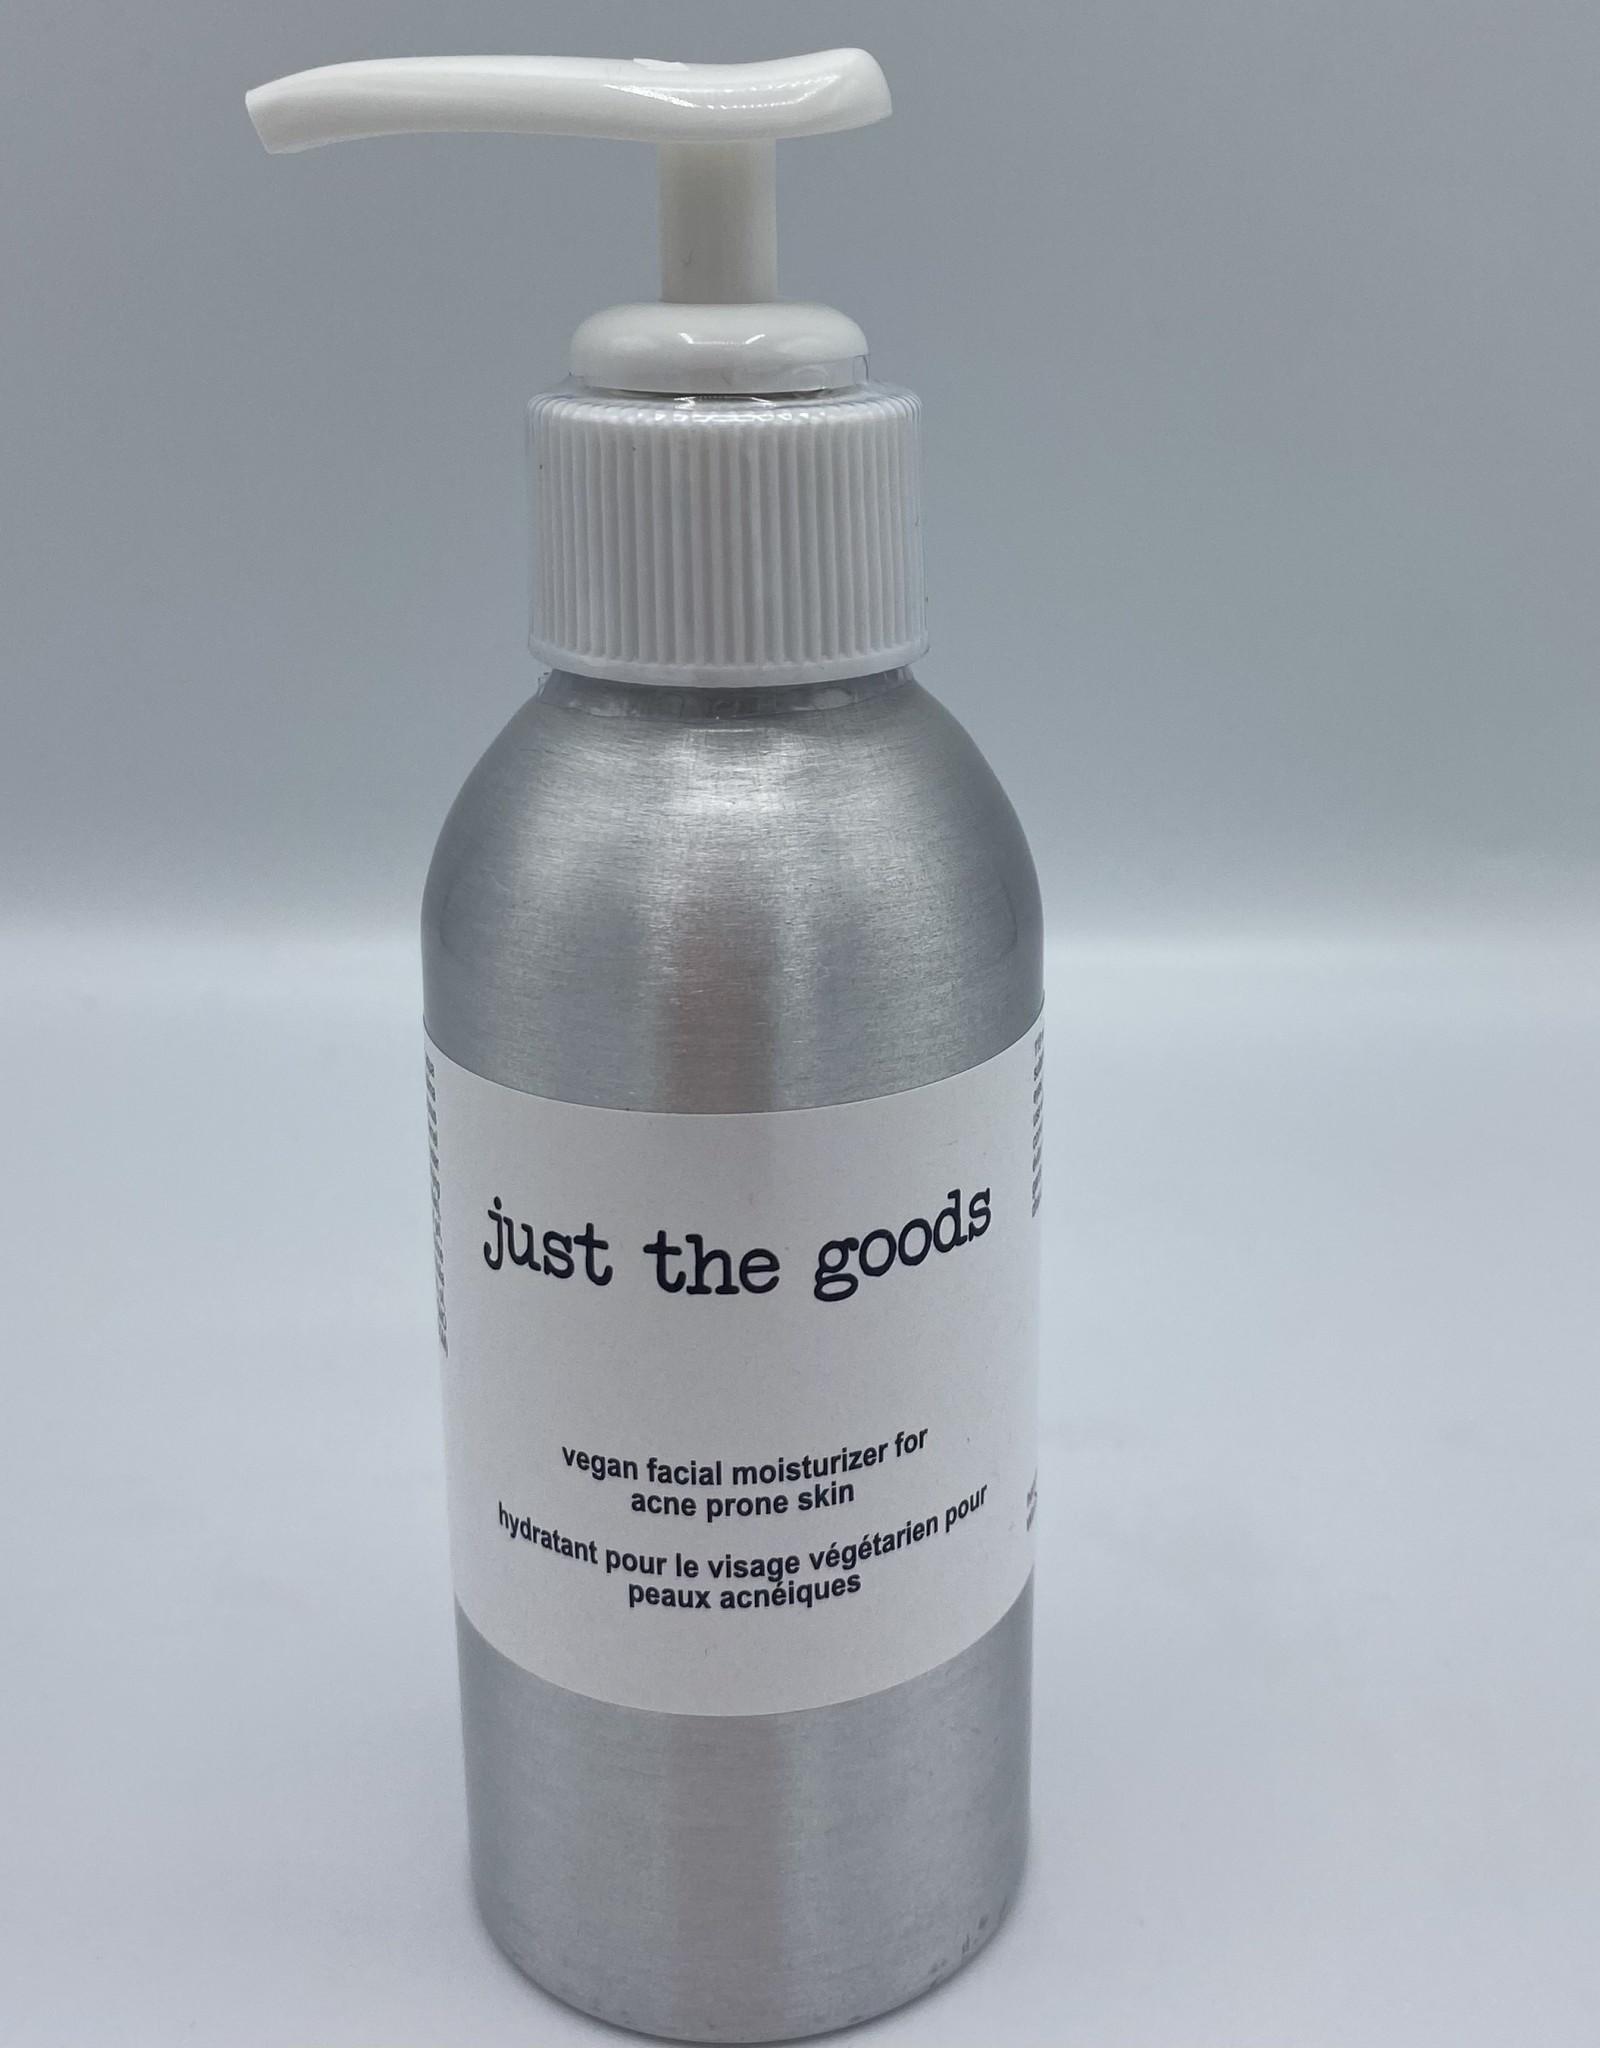 Just the Goods Vegan Moisturizer Acne Prone Skin